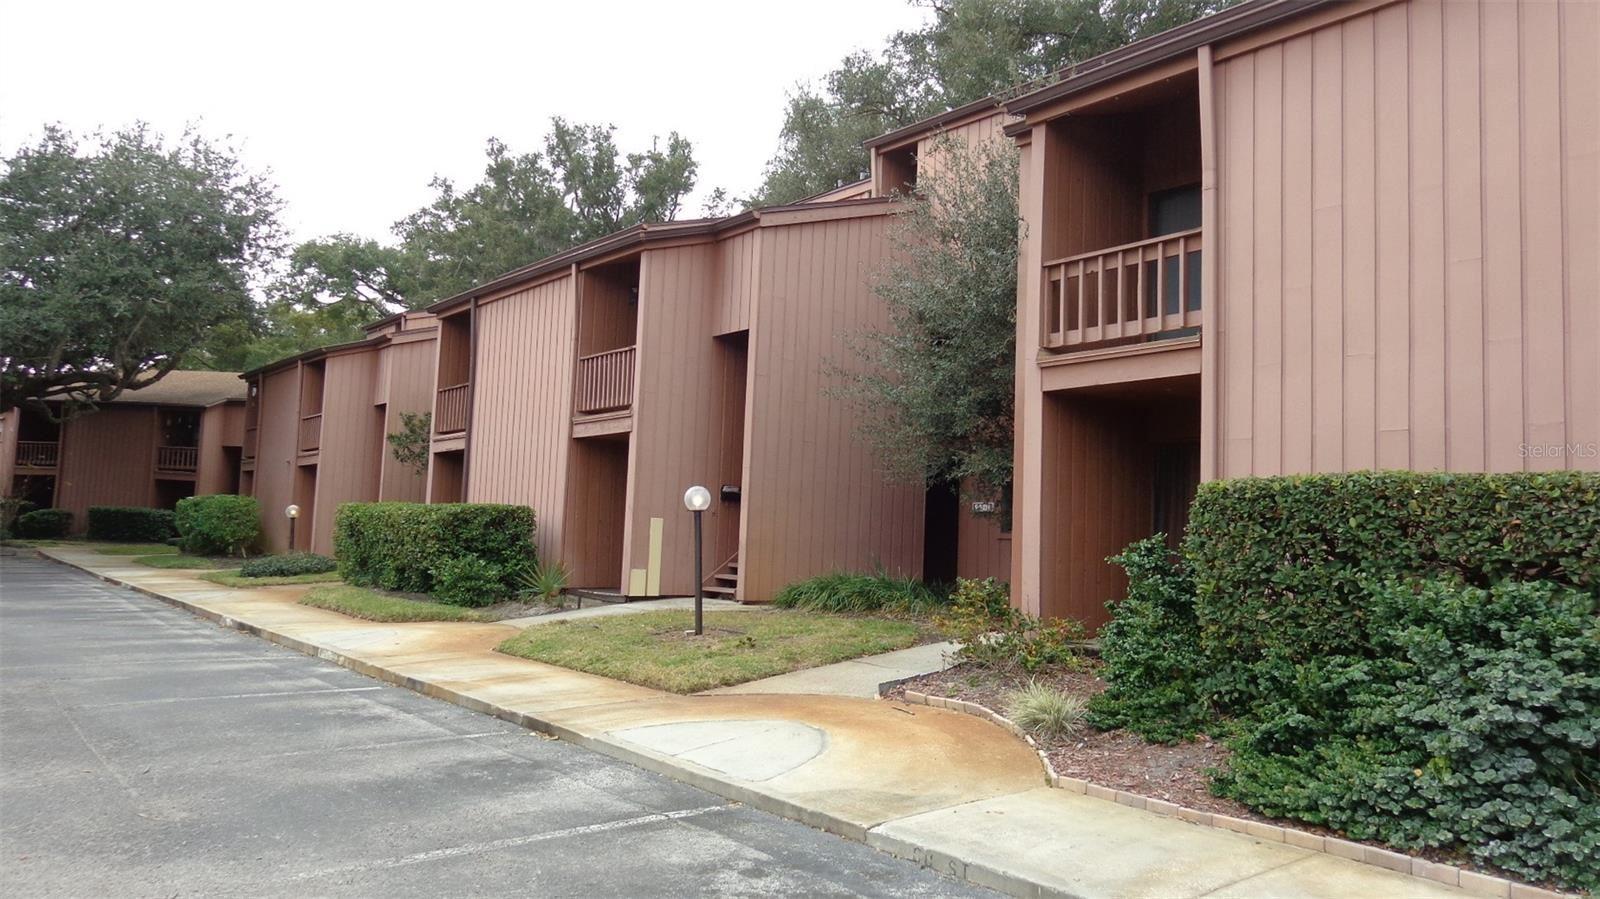 942 E MICHIGAN STREET #B, Orlando, FL 32806 - MLS#: O5941398